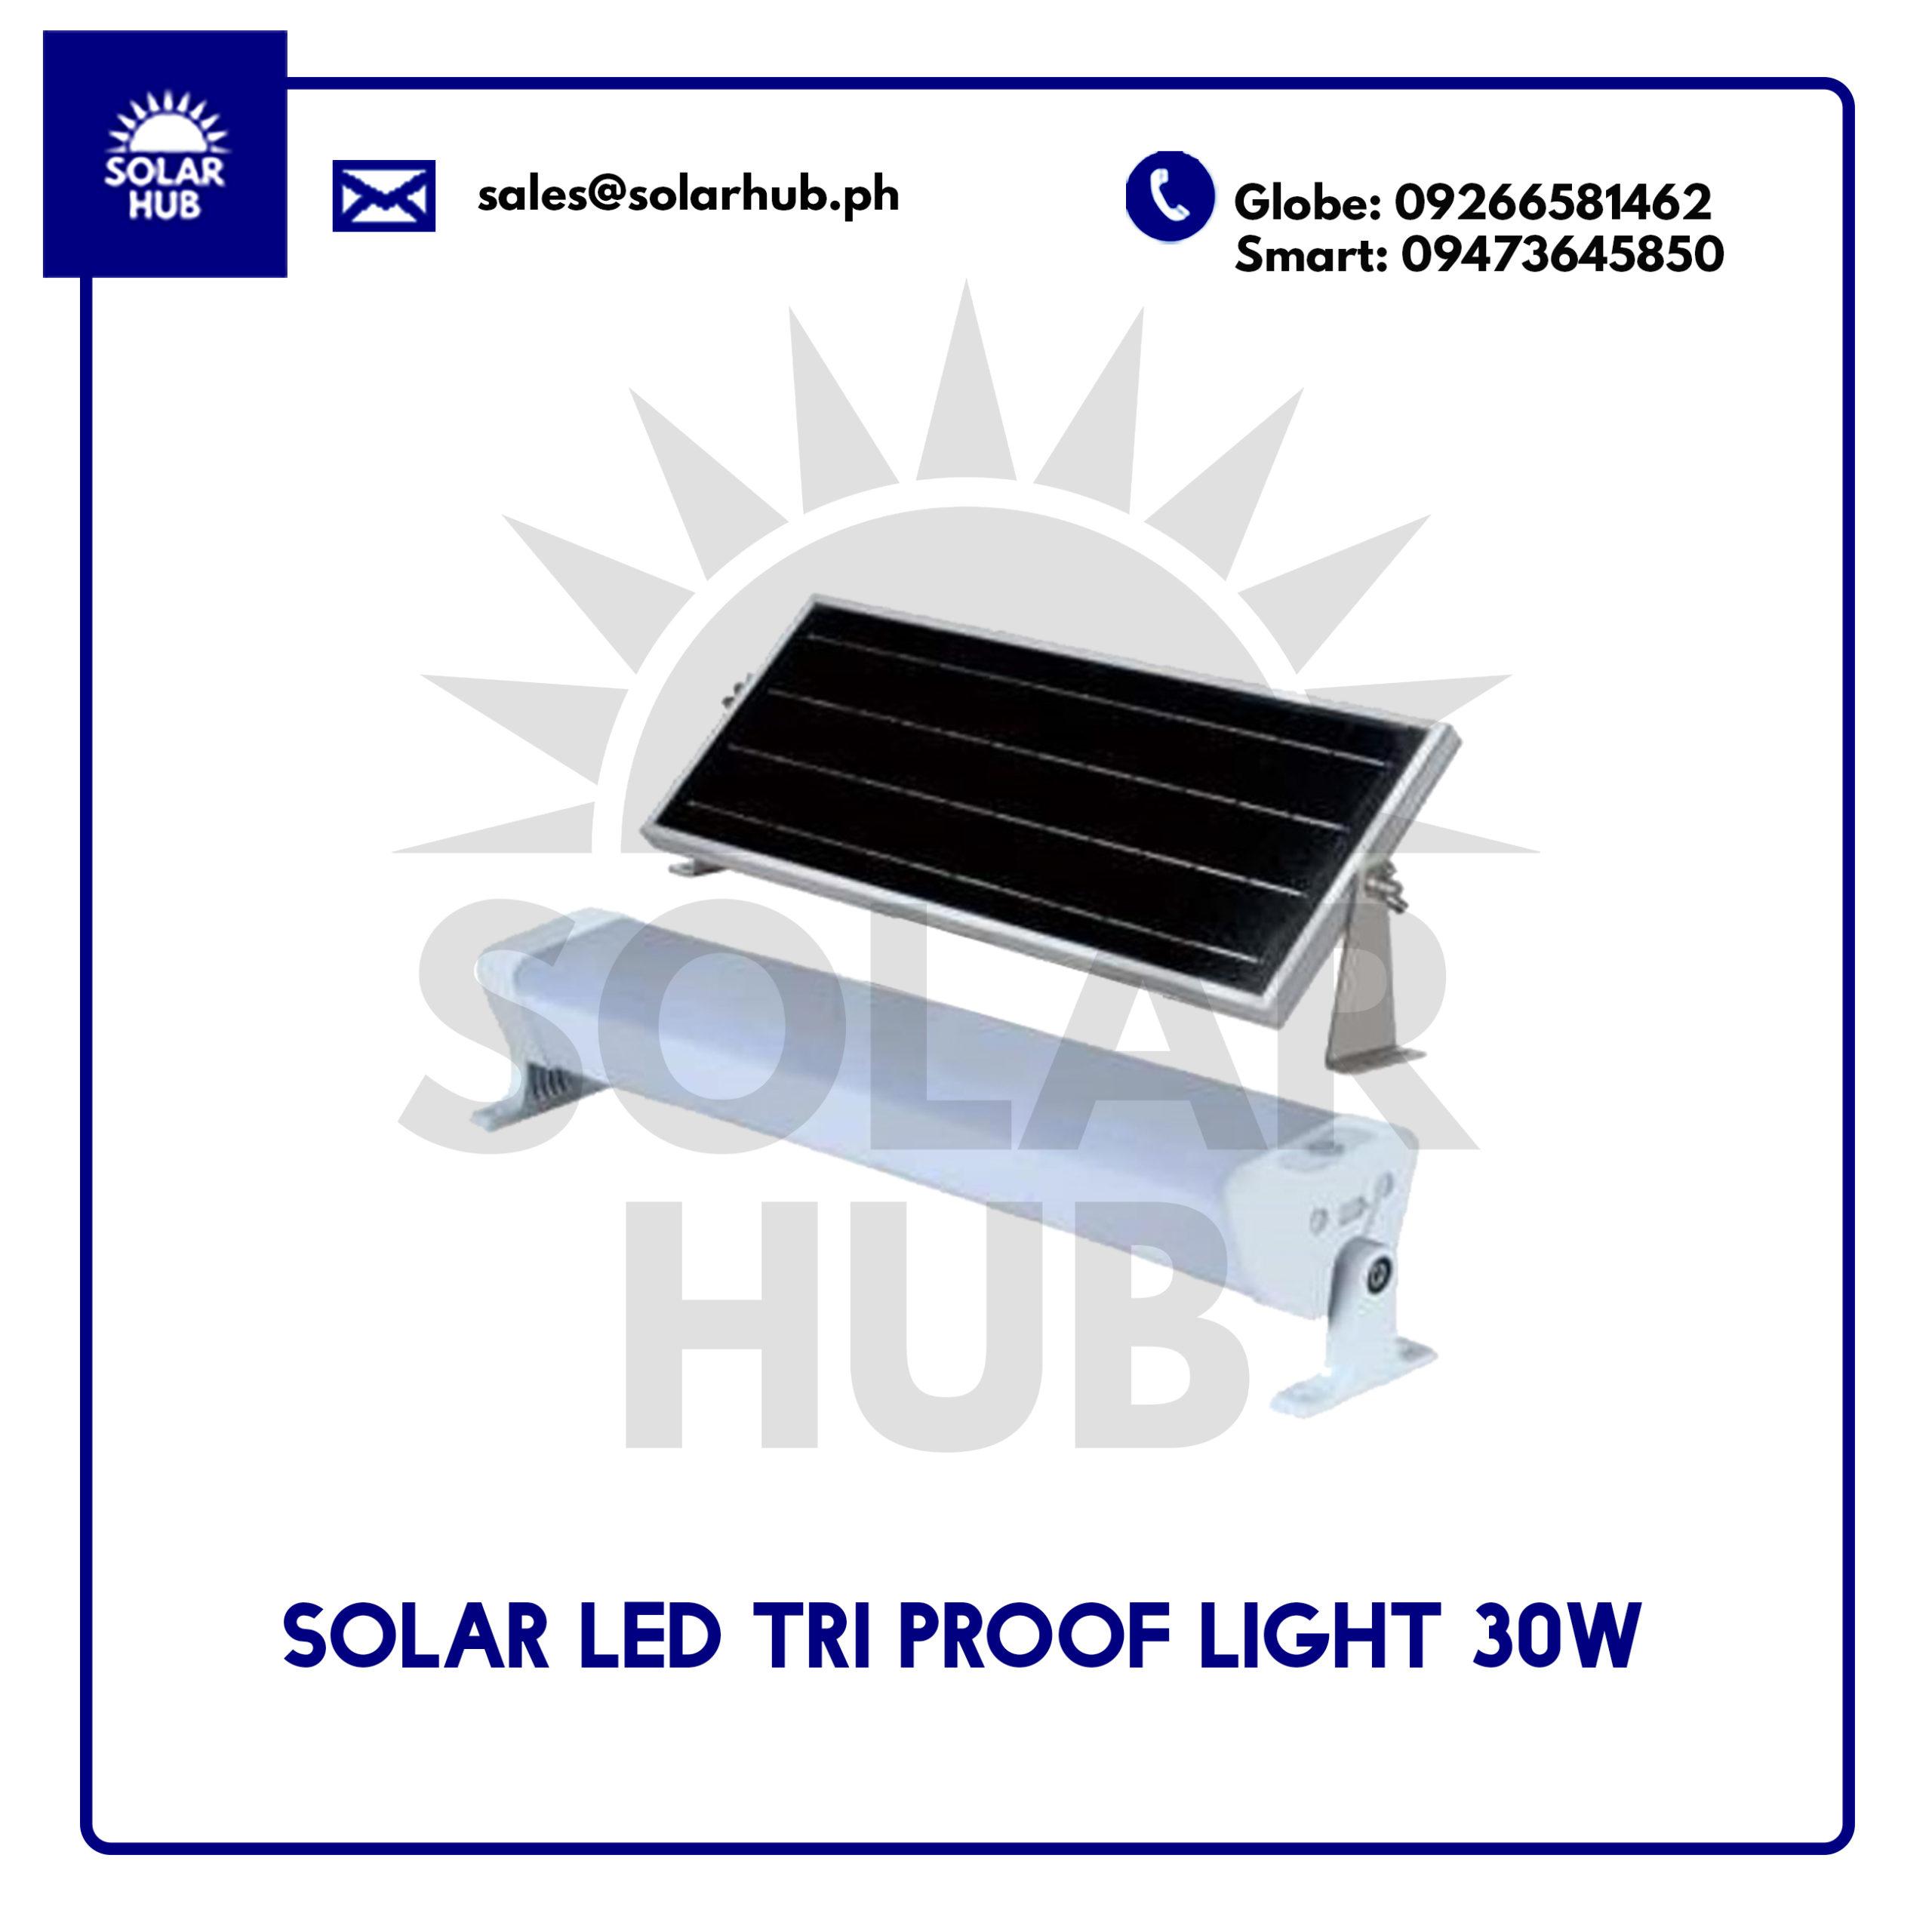 Solar LED Tri Proof Light 30W